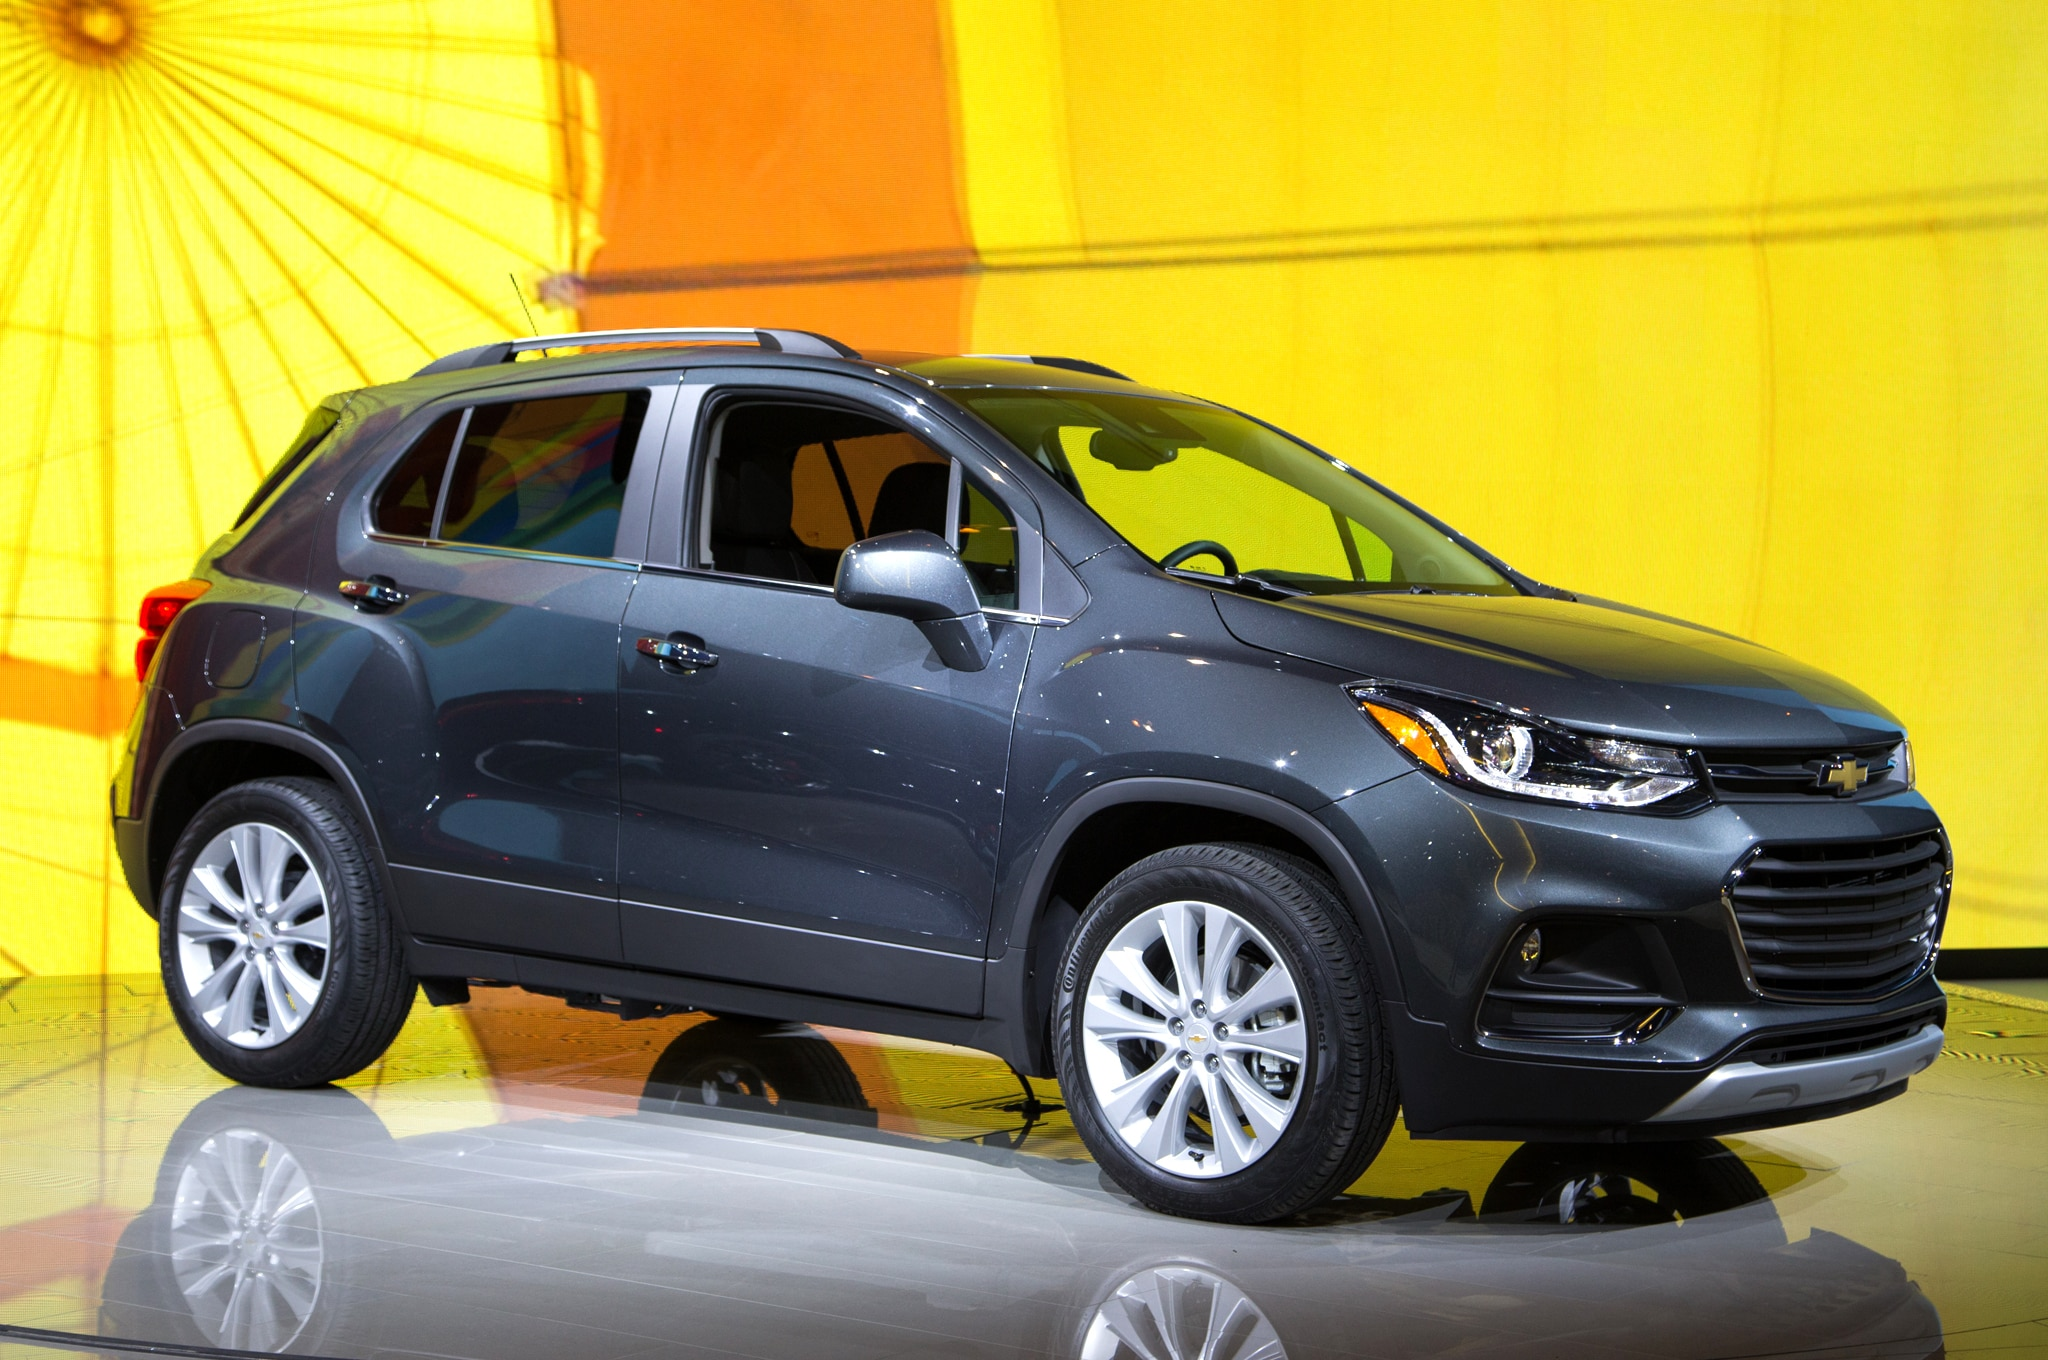 2017 Chevrolet Trax Front Three Quarter 02